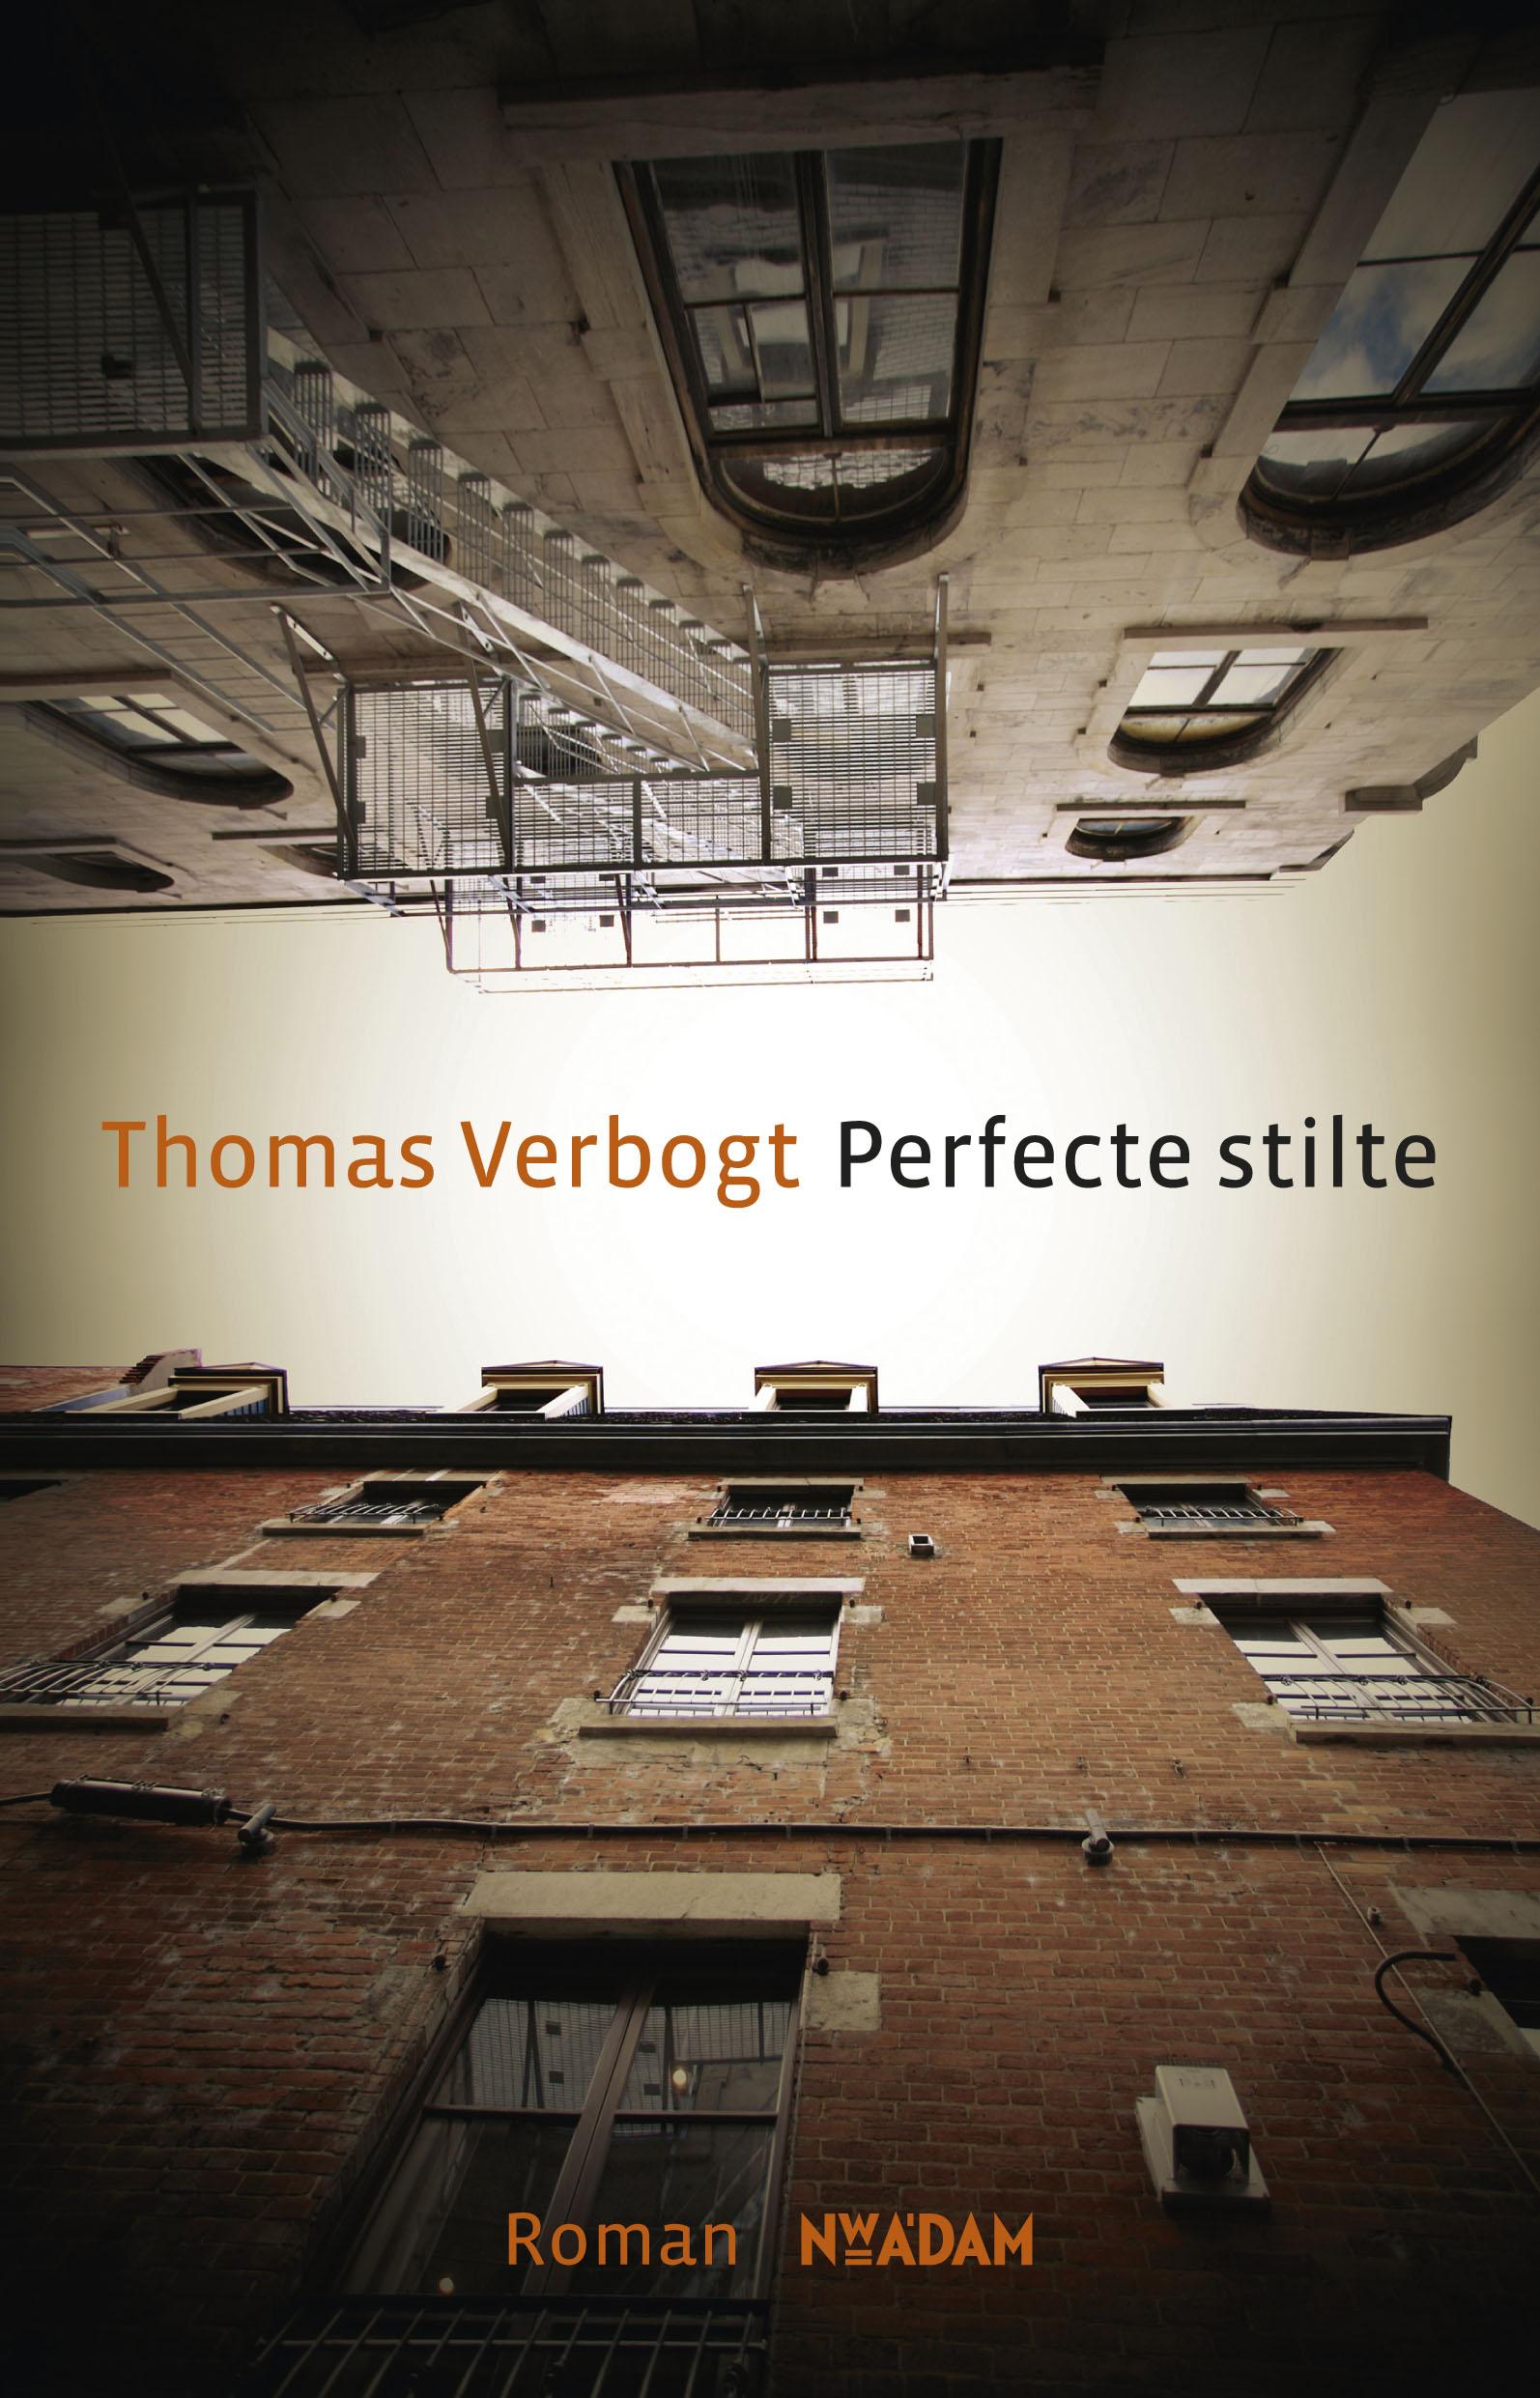 Perfecte stilte – Thomas Verbogt